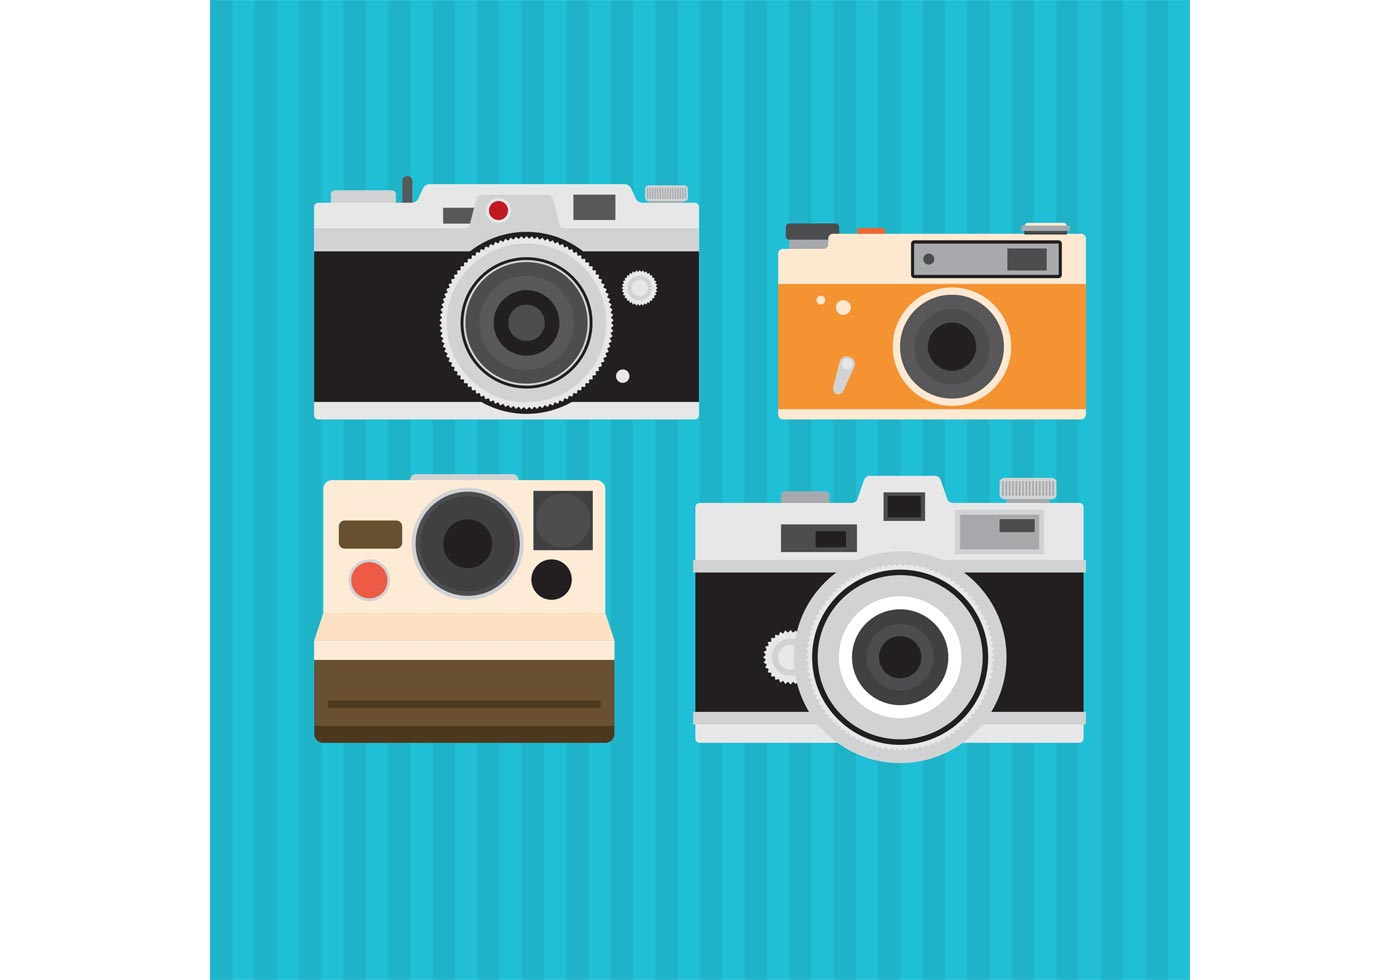 Old Vintage Camera Vectors - Download Free Vector Art ...